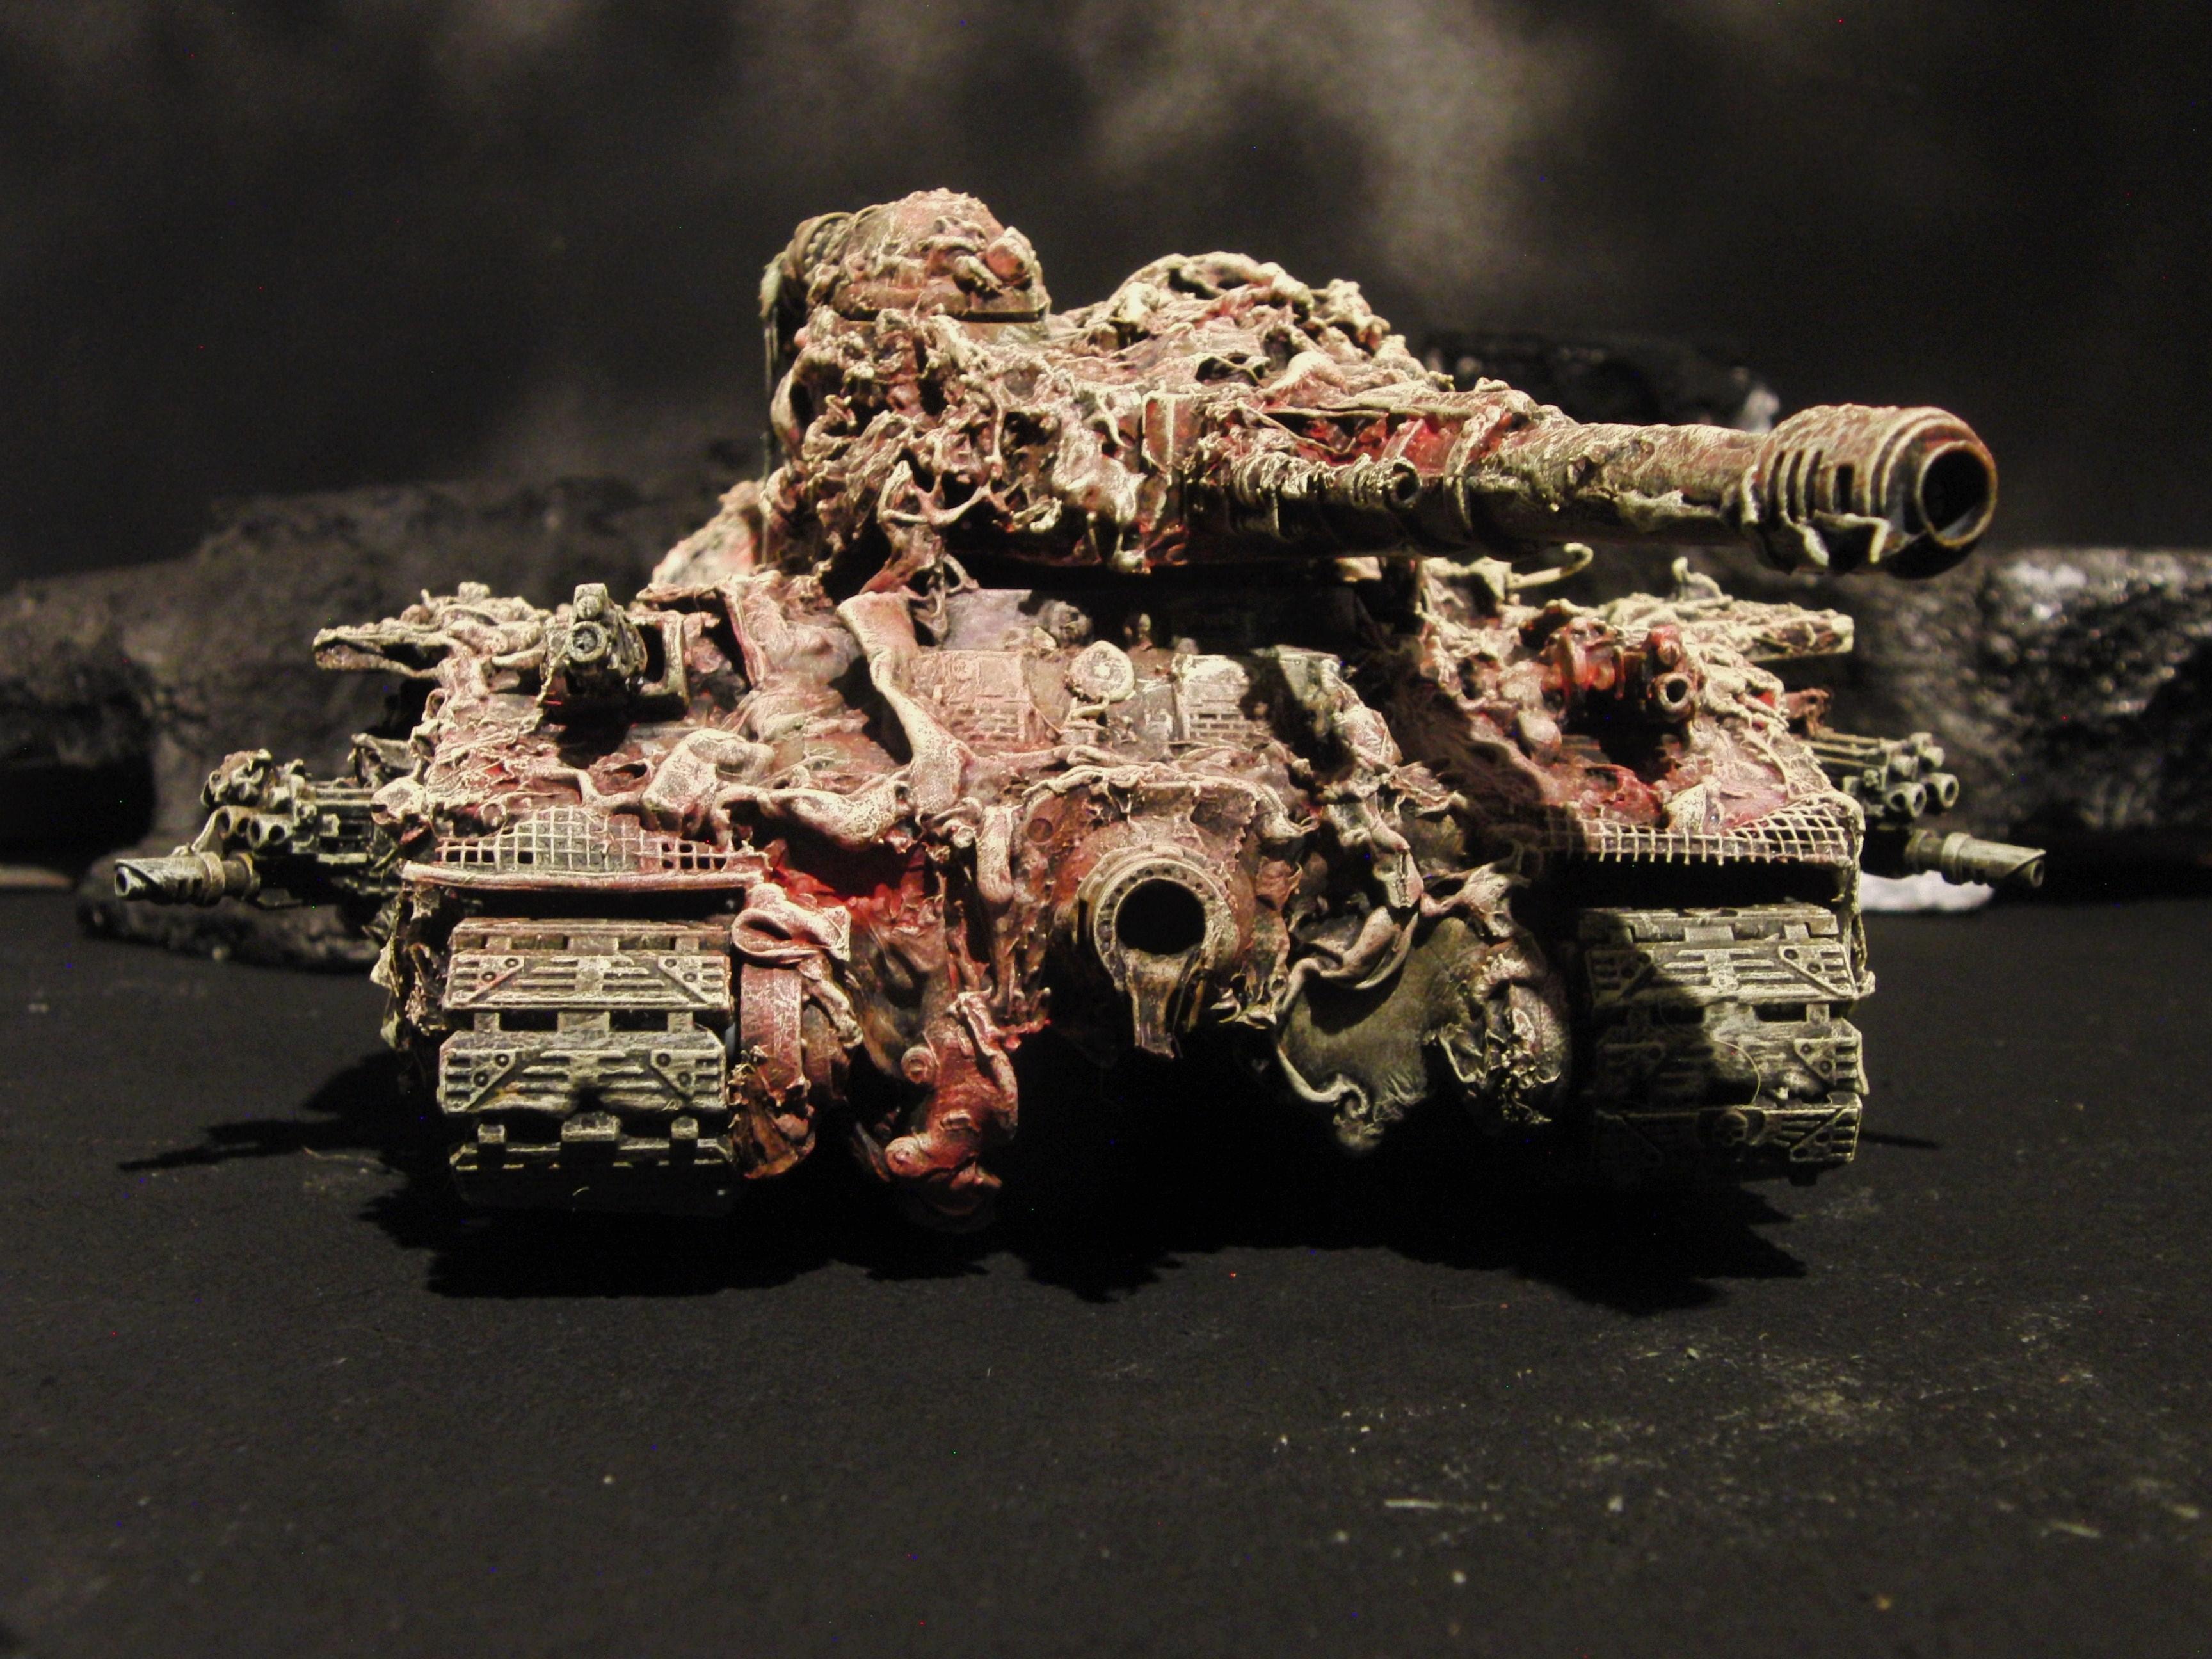 Baneblade, Chaos, Nurgle, Super-heavy, Tank, Traitor Guard